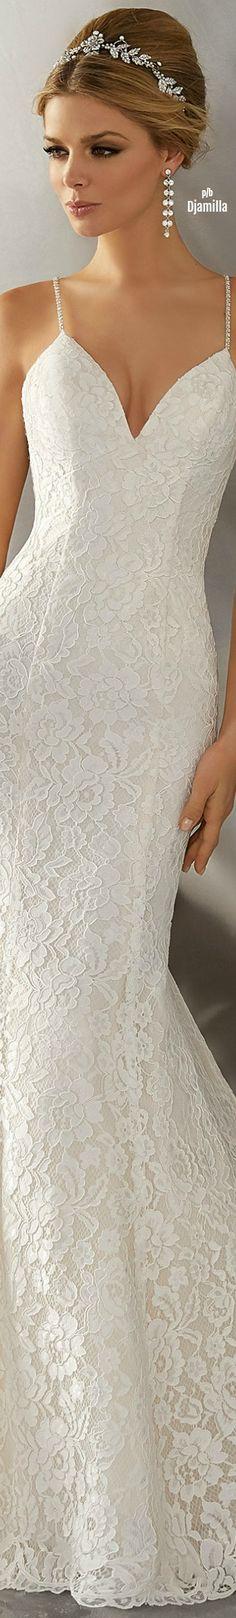 Wedding Dress - Voyagé Collection